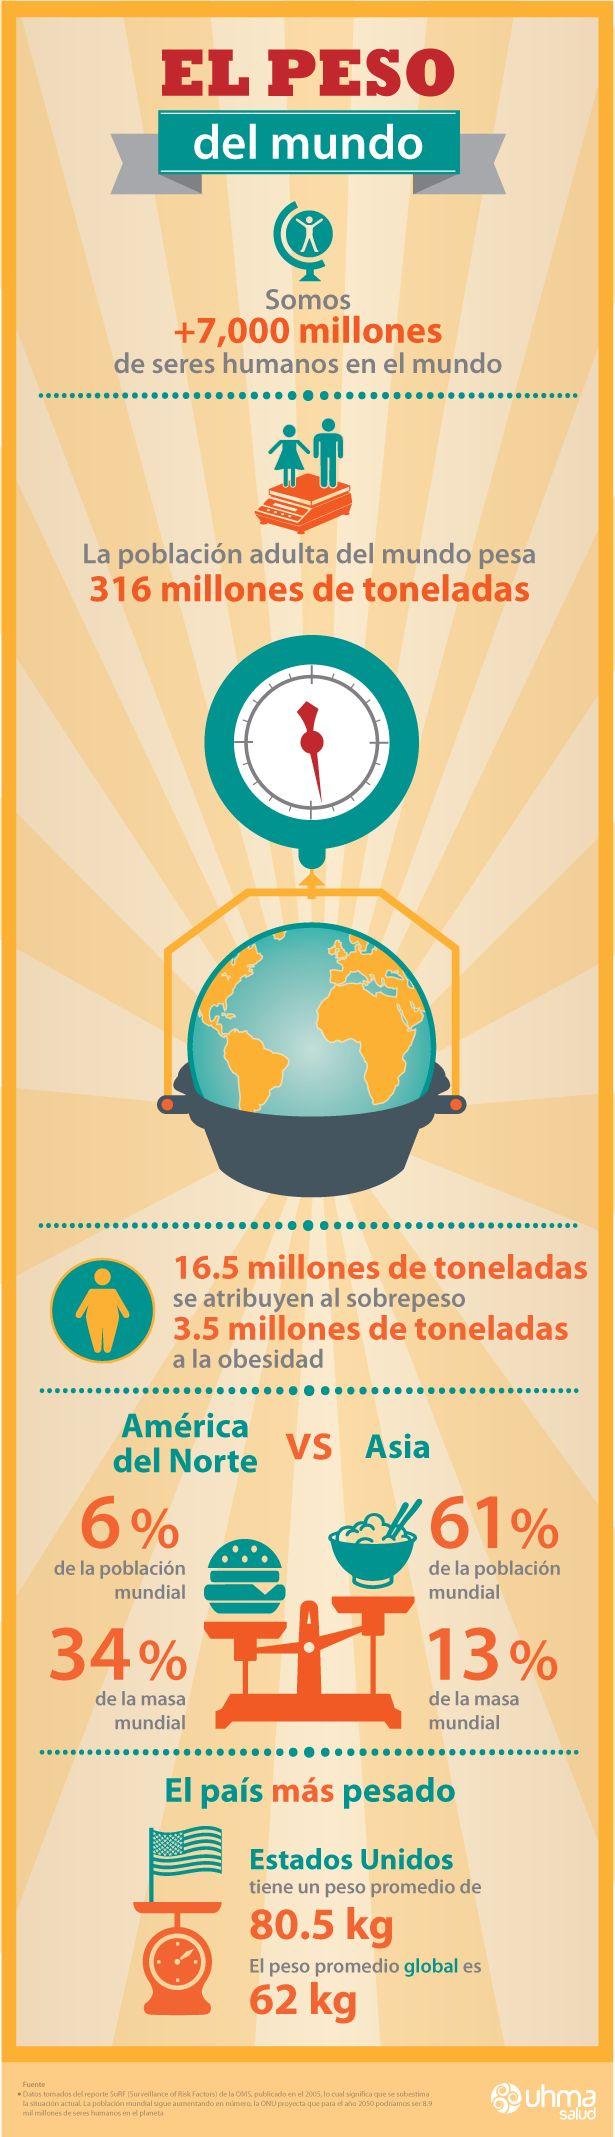 Infografía peso del mundo. / Infographic Weight of the World.